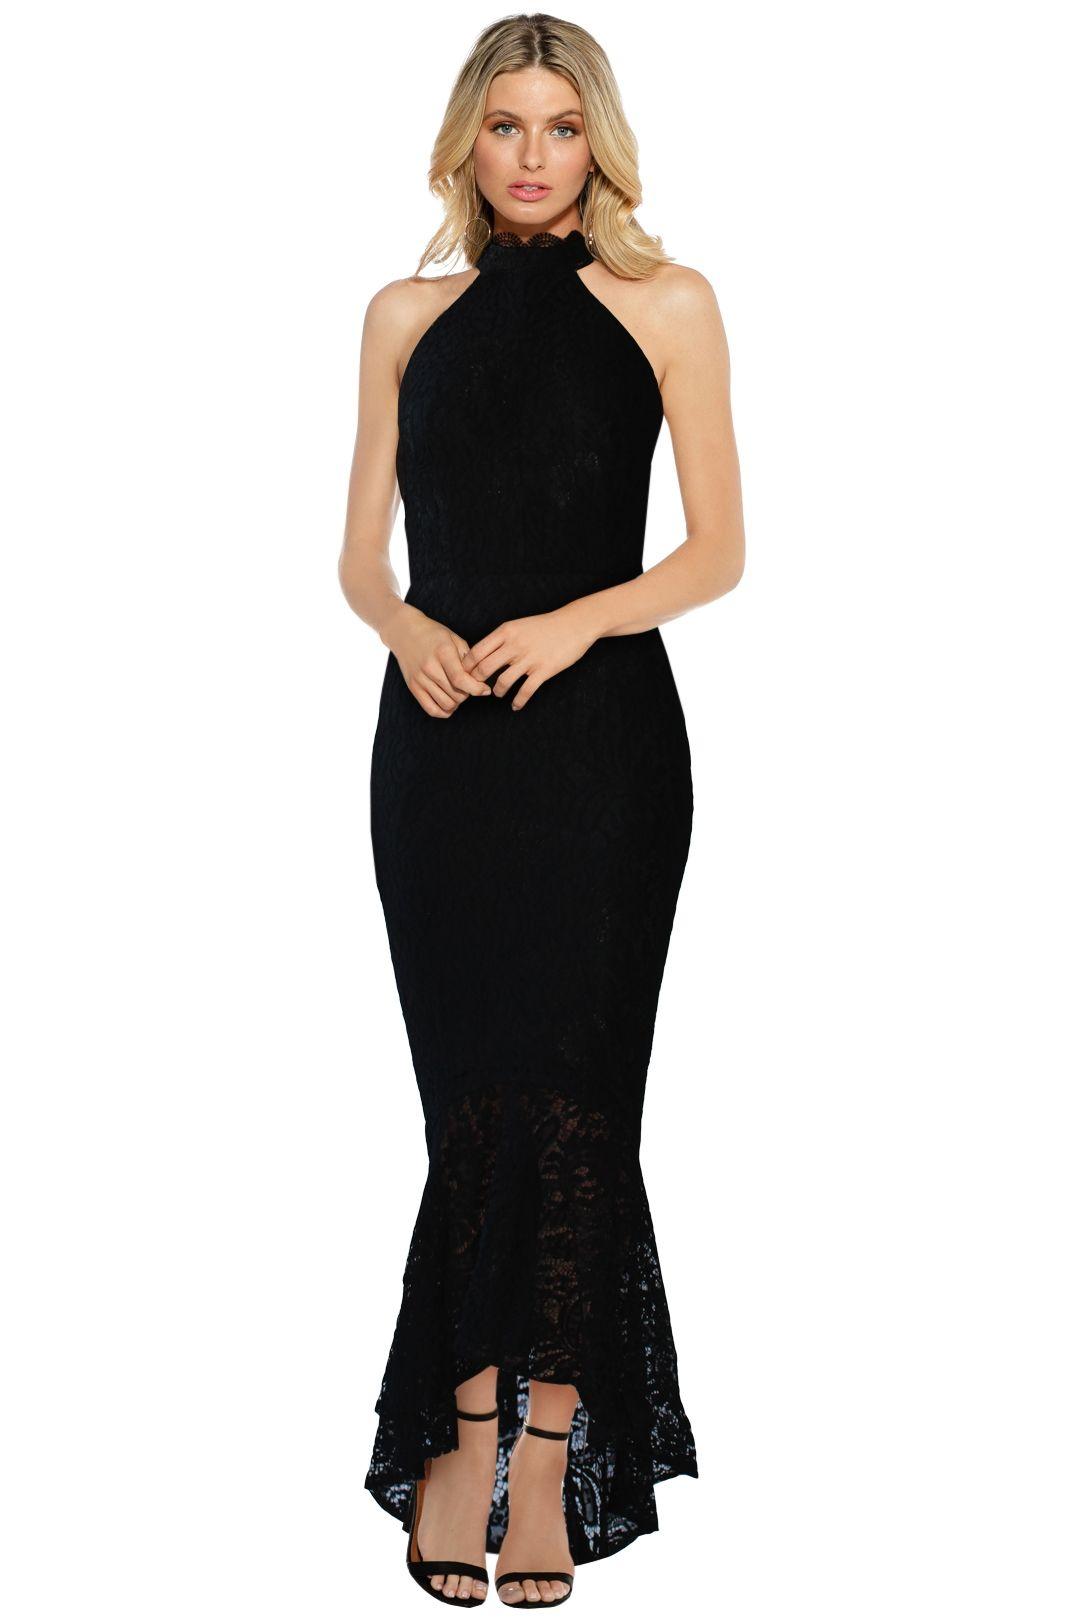 Elle Zeitoune - Mirabella Gown - Black - Front